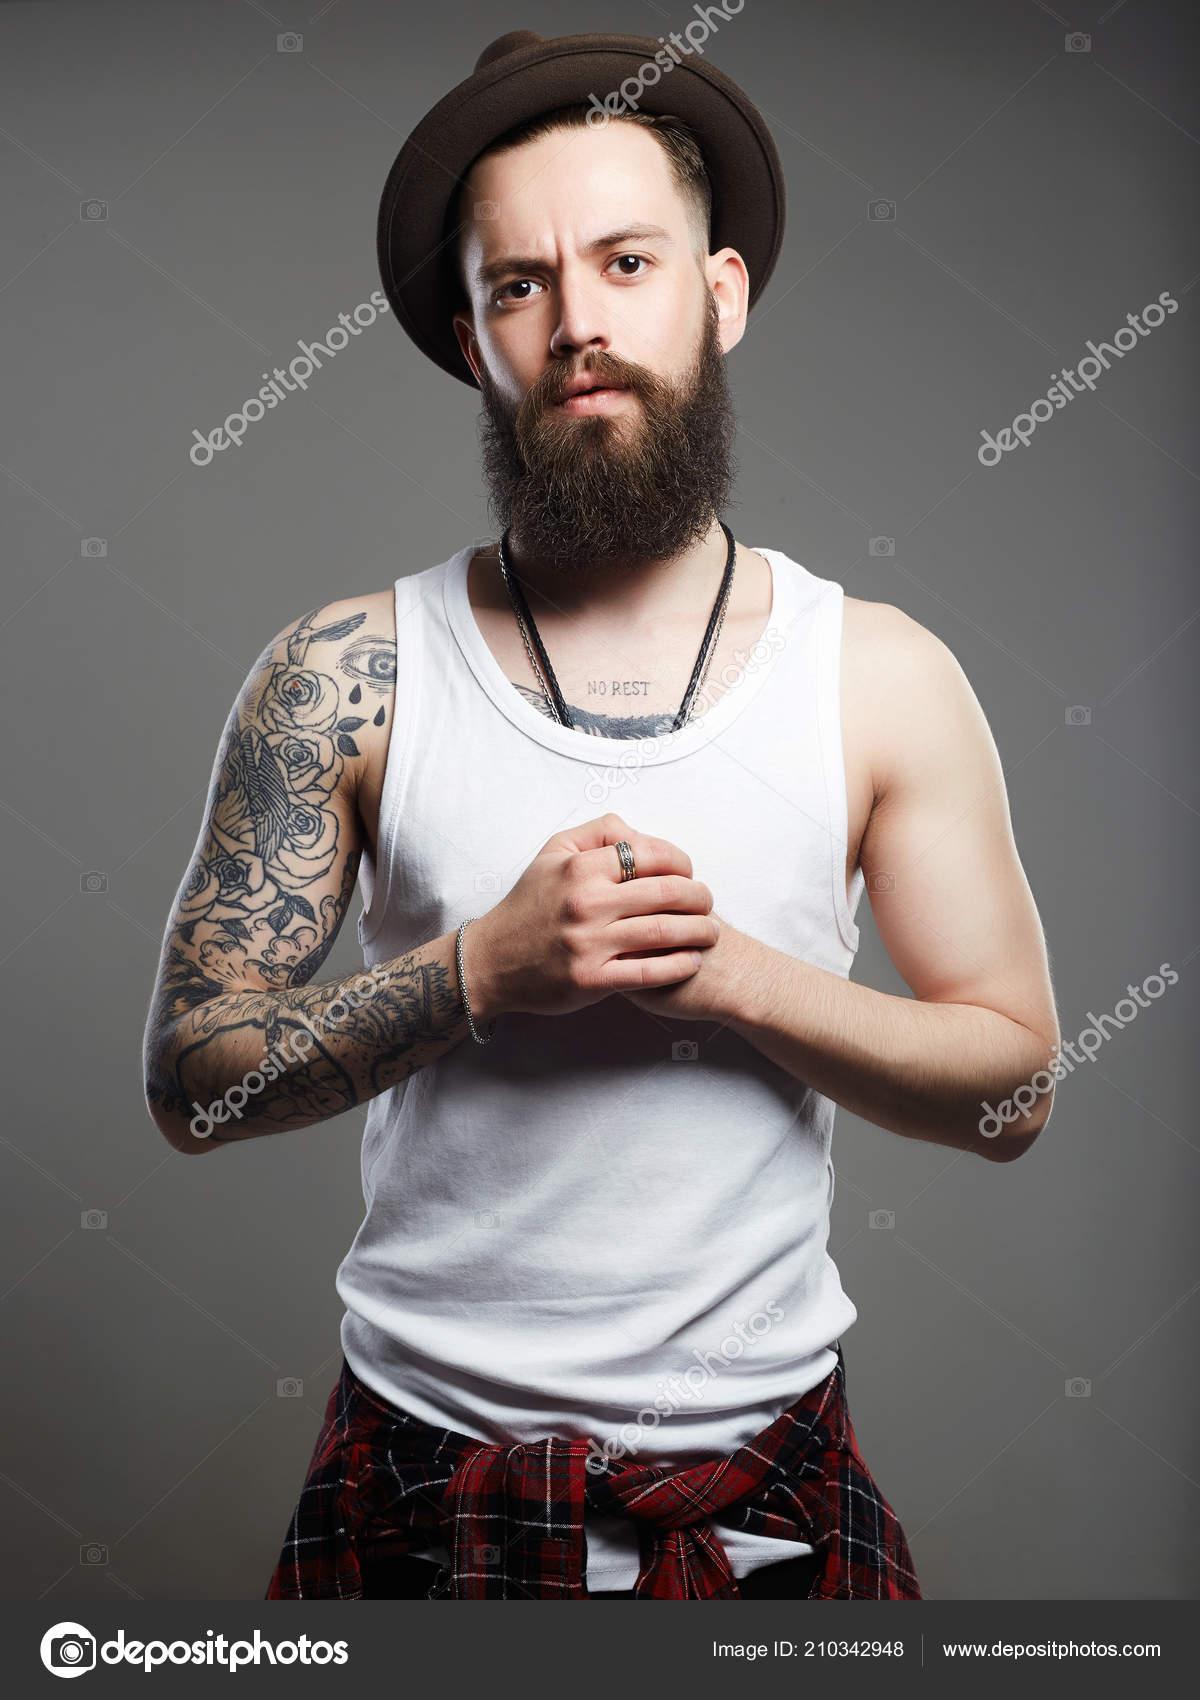 Guapo Hombre Barbudo Con Sombrero Chico Hipster Brutal Con Tatuaje — Fotos  de Stock 53bab9133e6